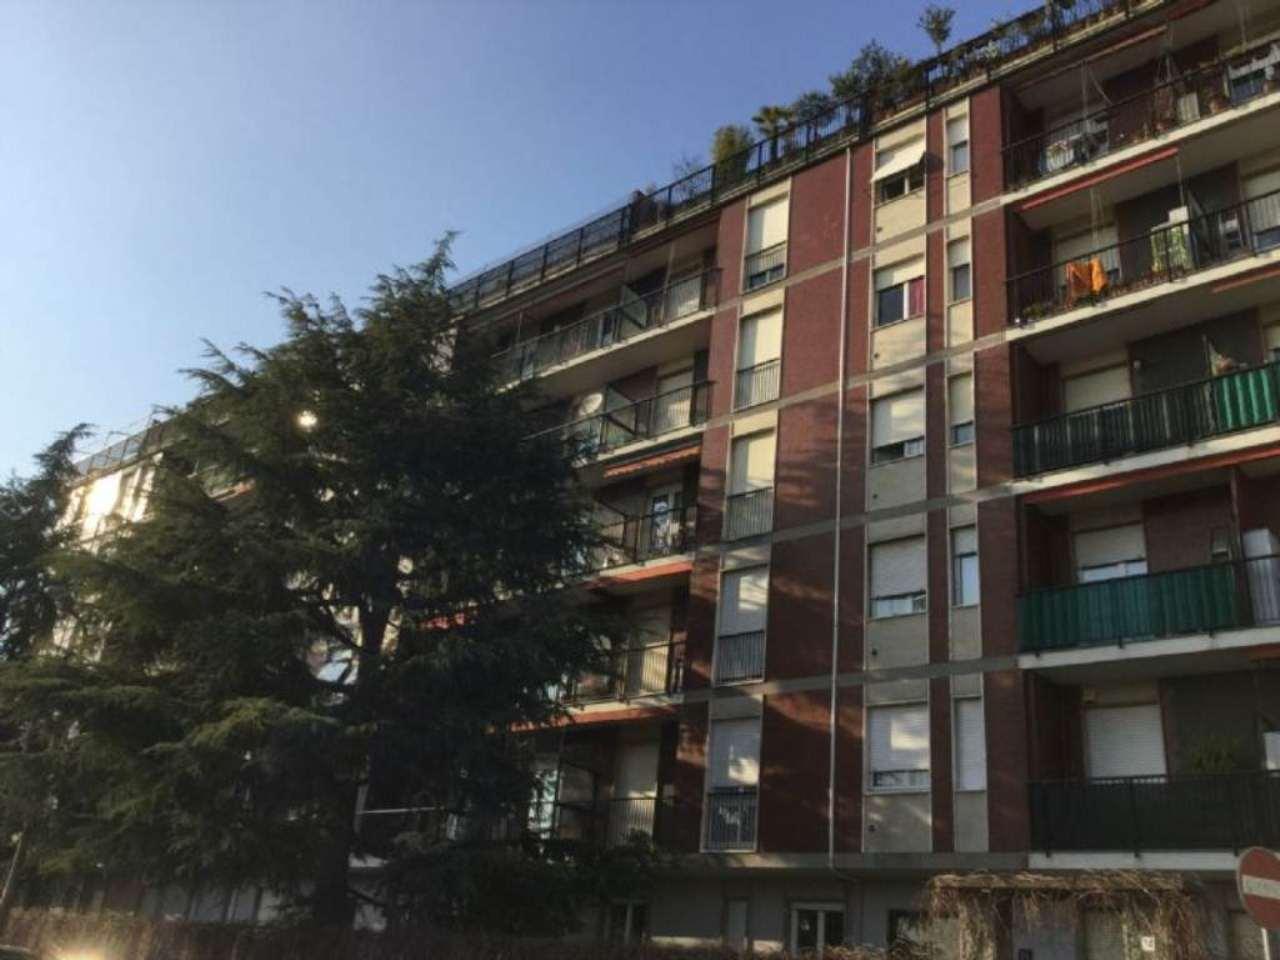 Bilocale Monza Via Via Buccari 1